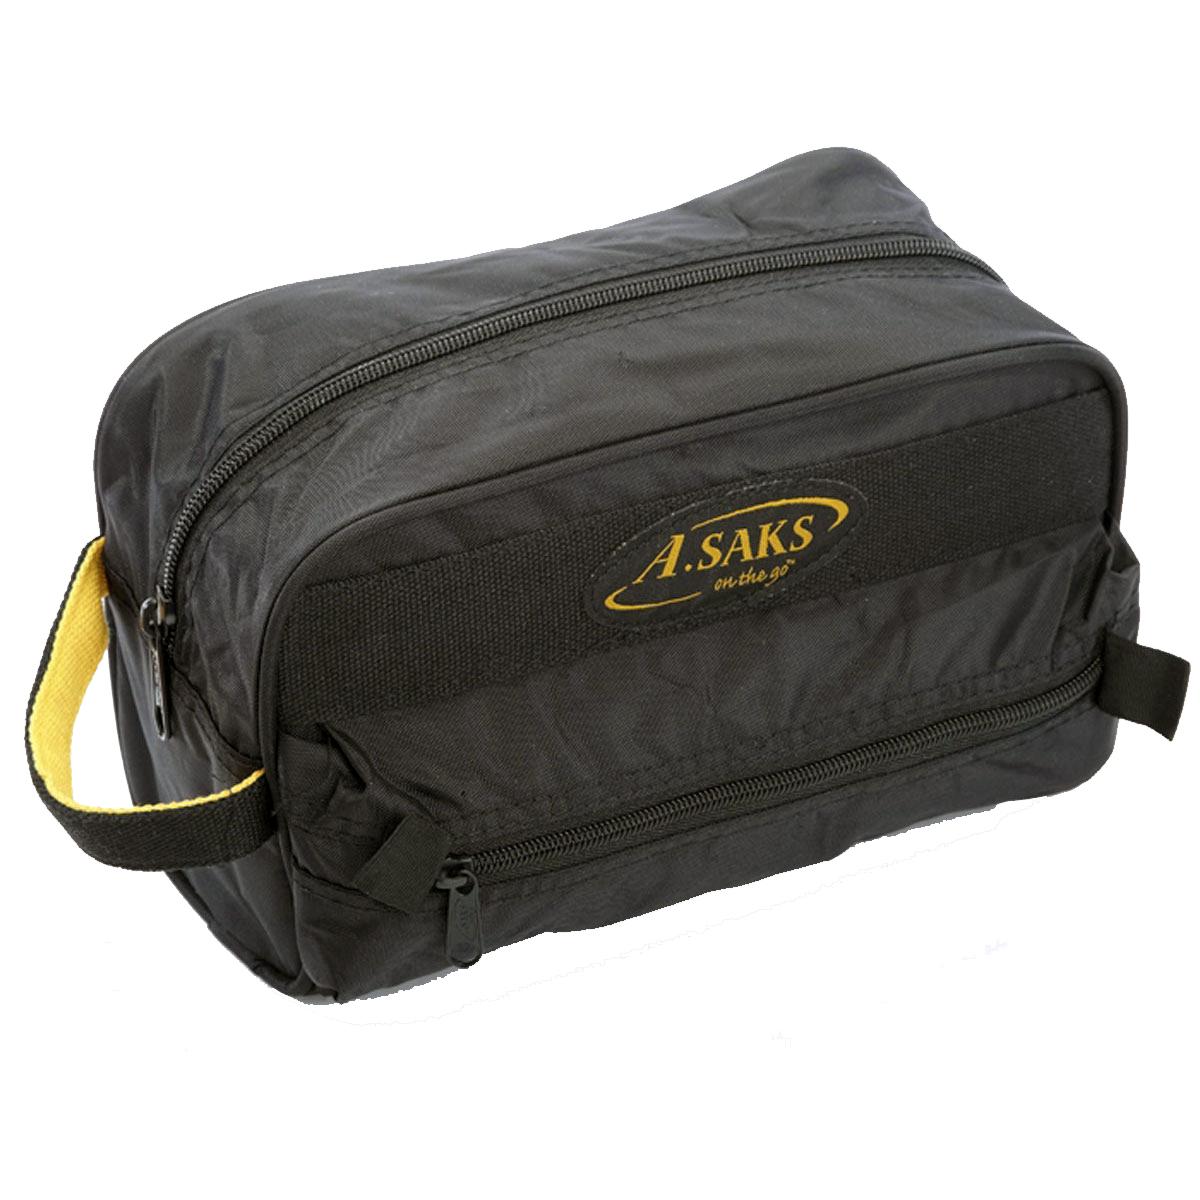 "Asaks AE-11 11"" x 7"" x 4"" Deluxe Toiletry Kit"